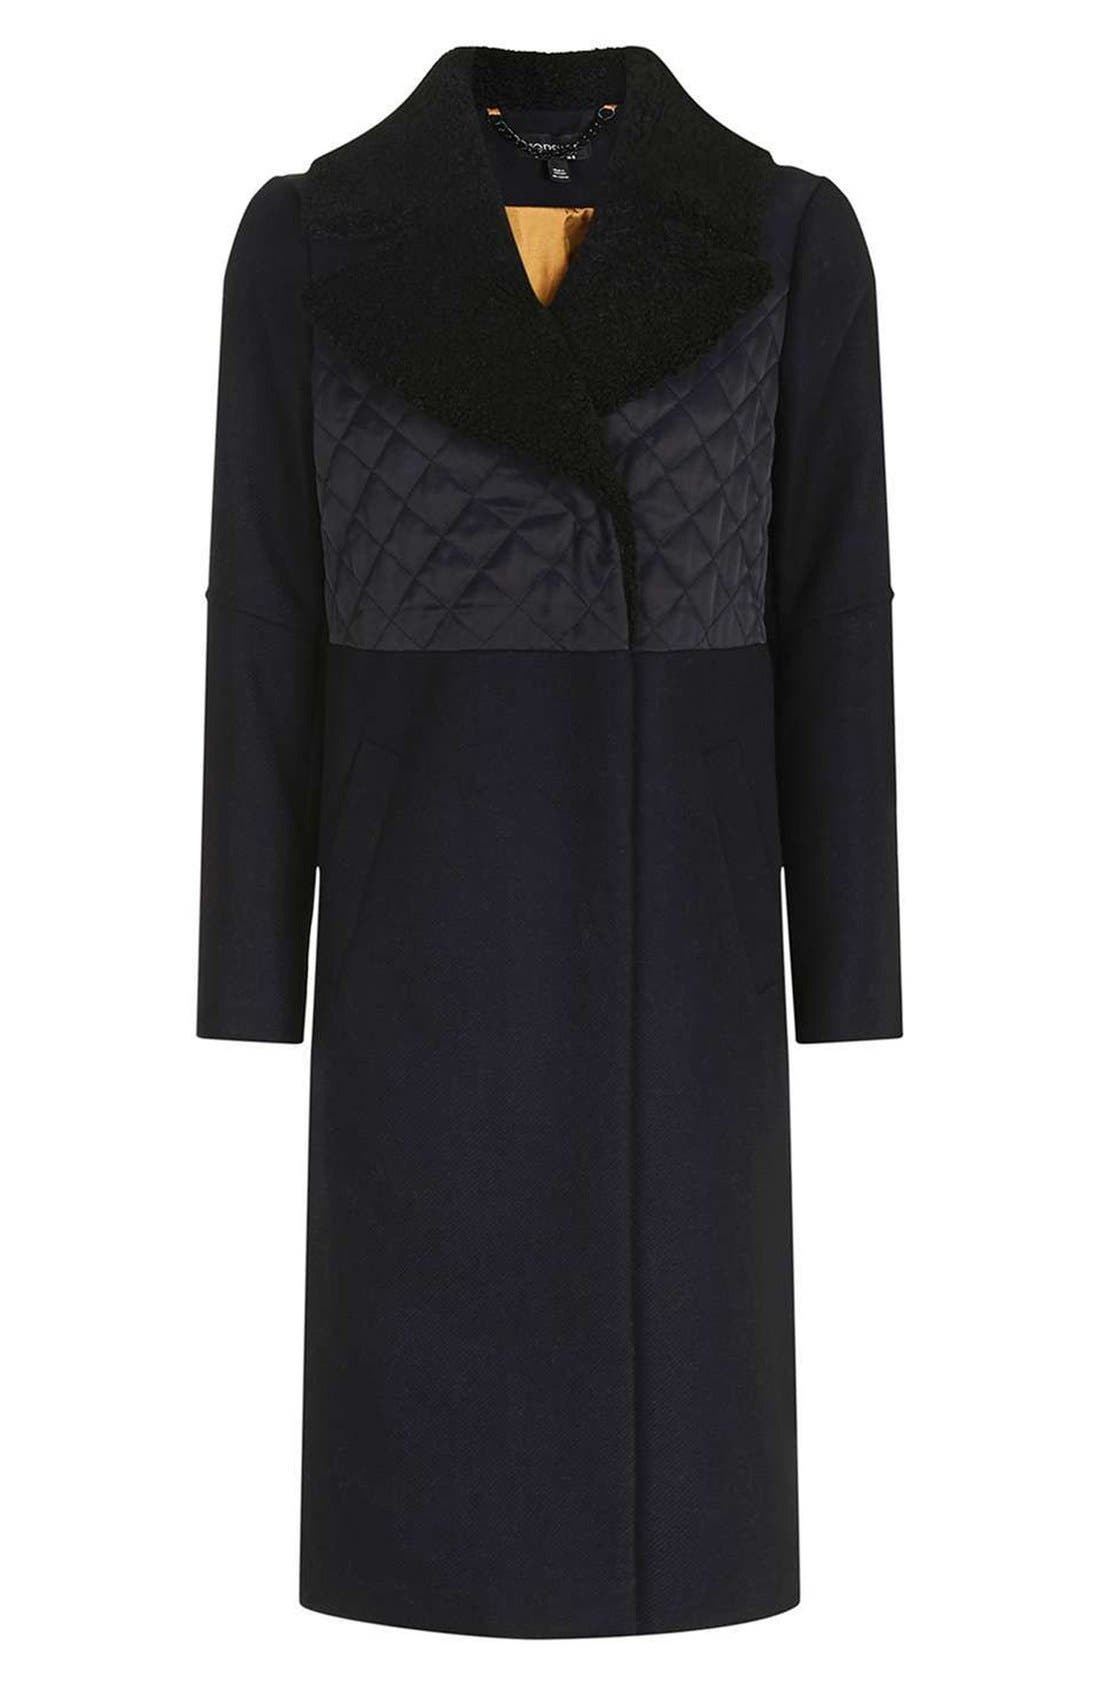 TOPSHOP, Faux Shearling Collar Coat, Alternate thumbnail 5, color, 410